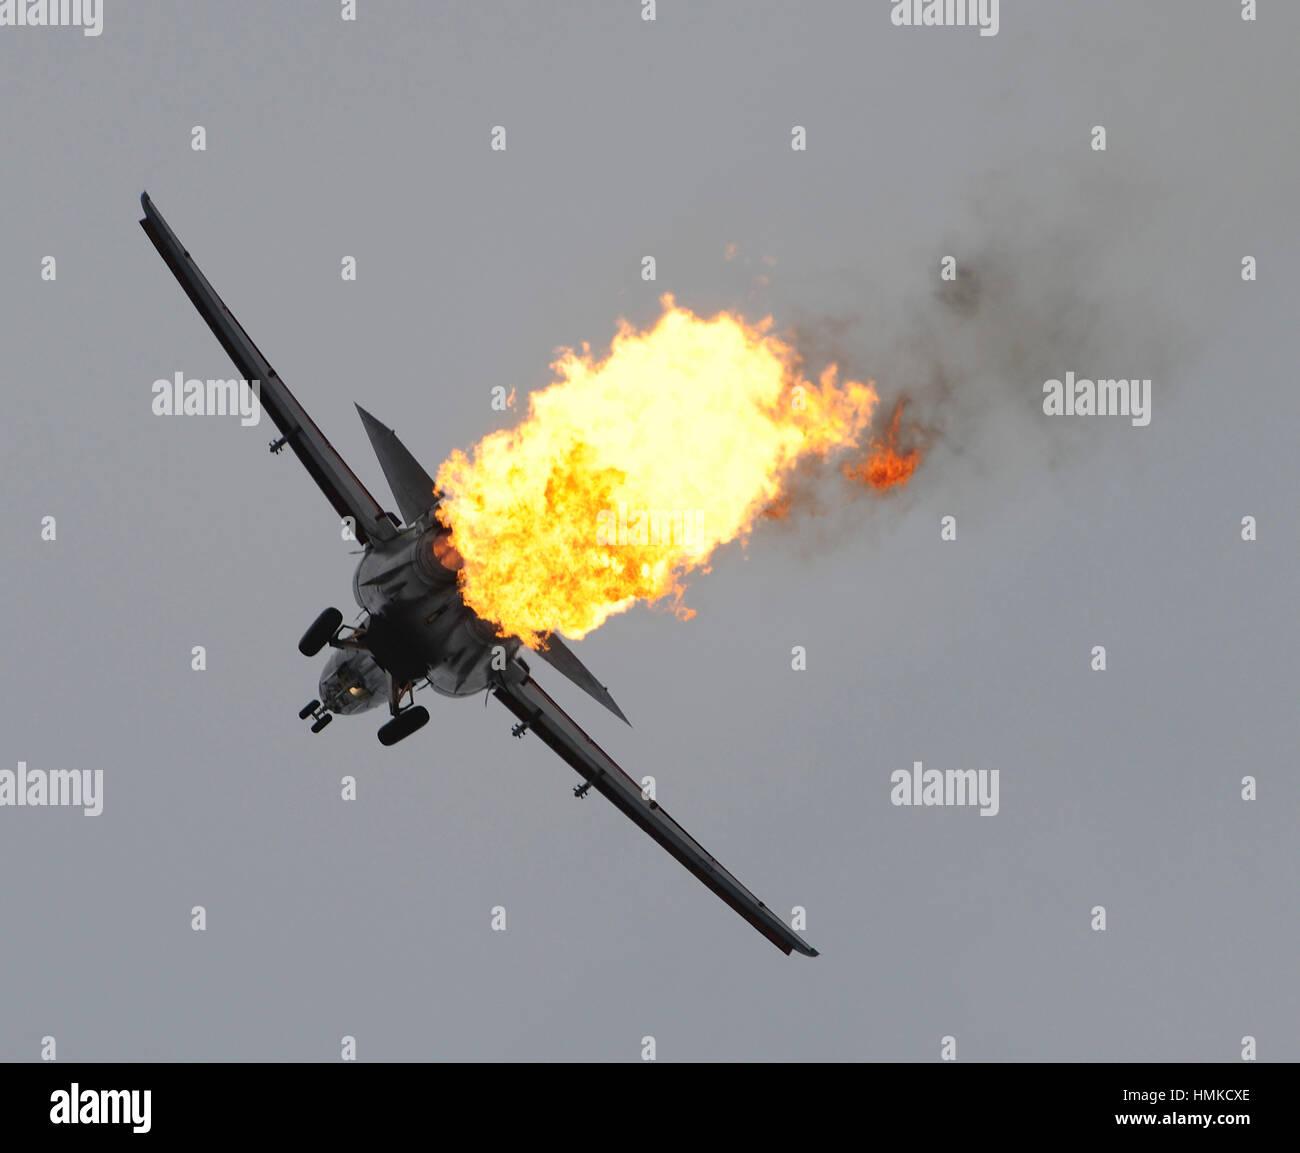 Royal Australian Air Force RAAF General Dynamics F-111C Aardvark ÔDragonÕs burnÕ in flying-display - Stock Image